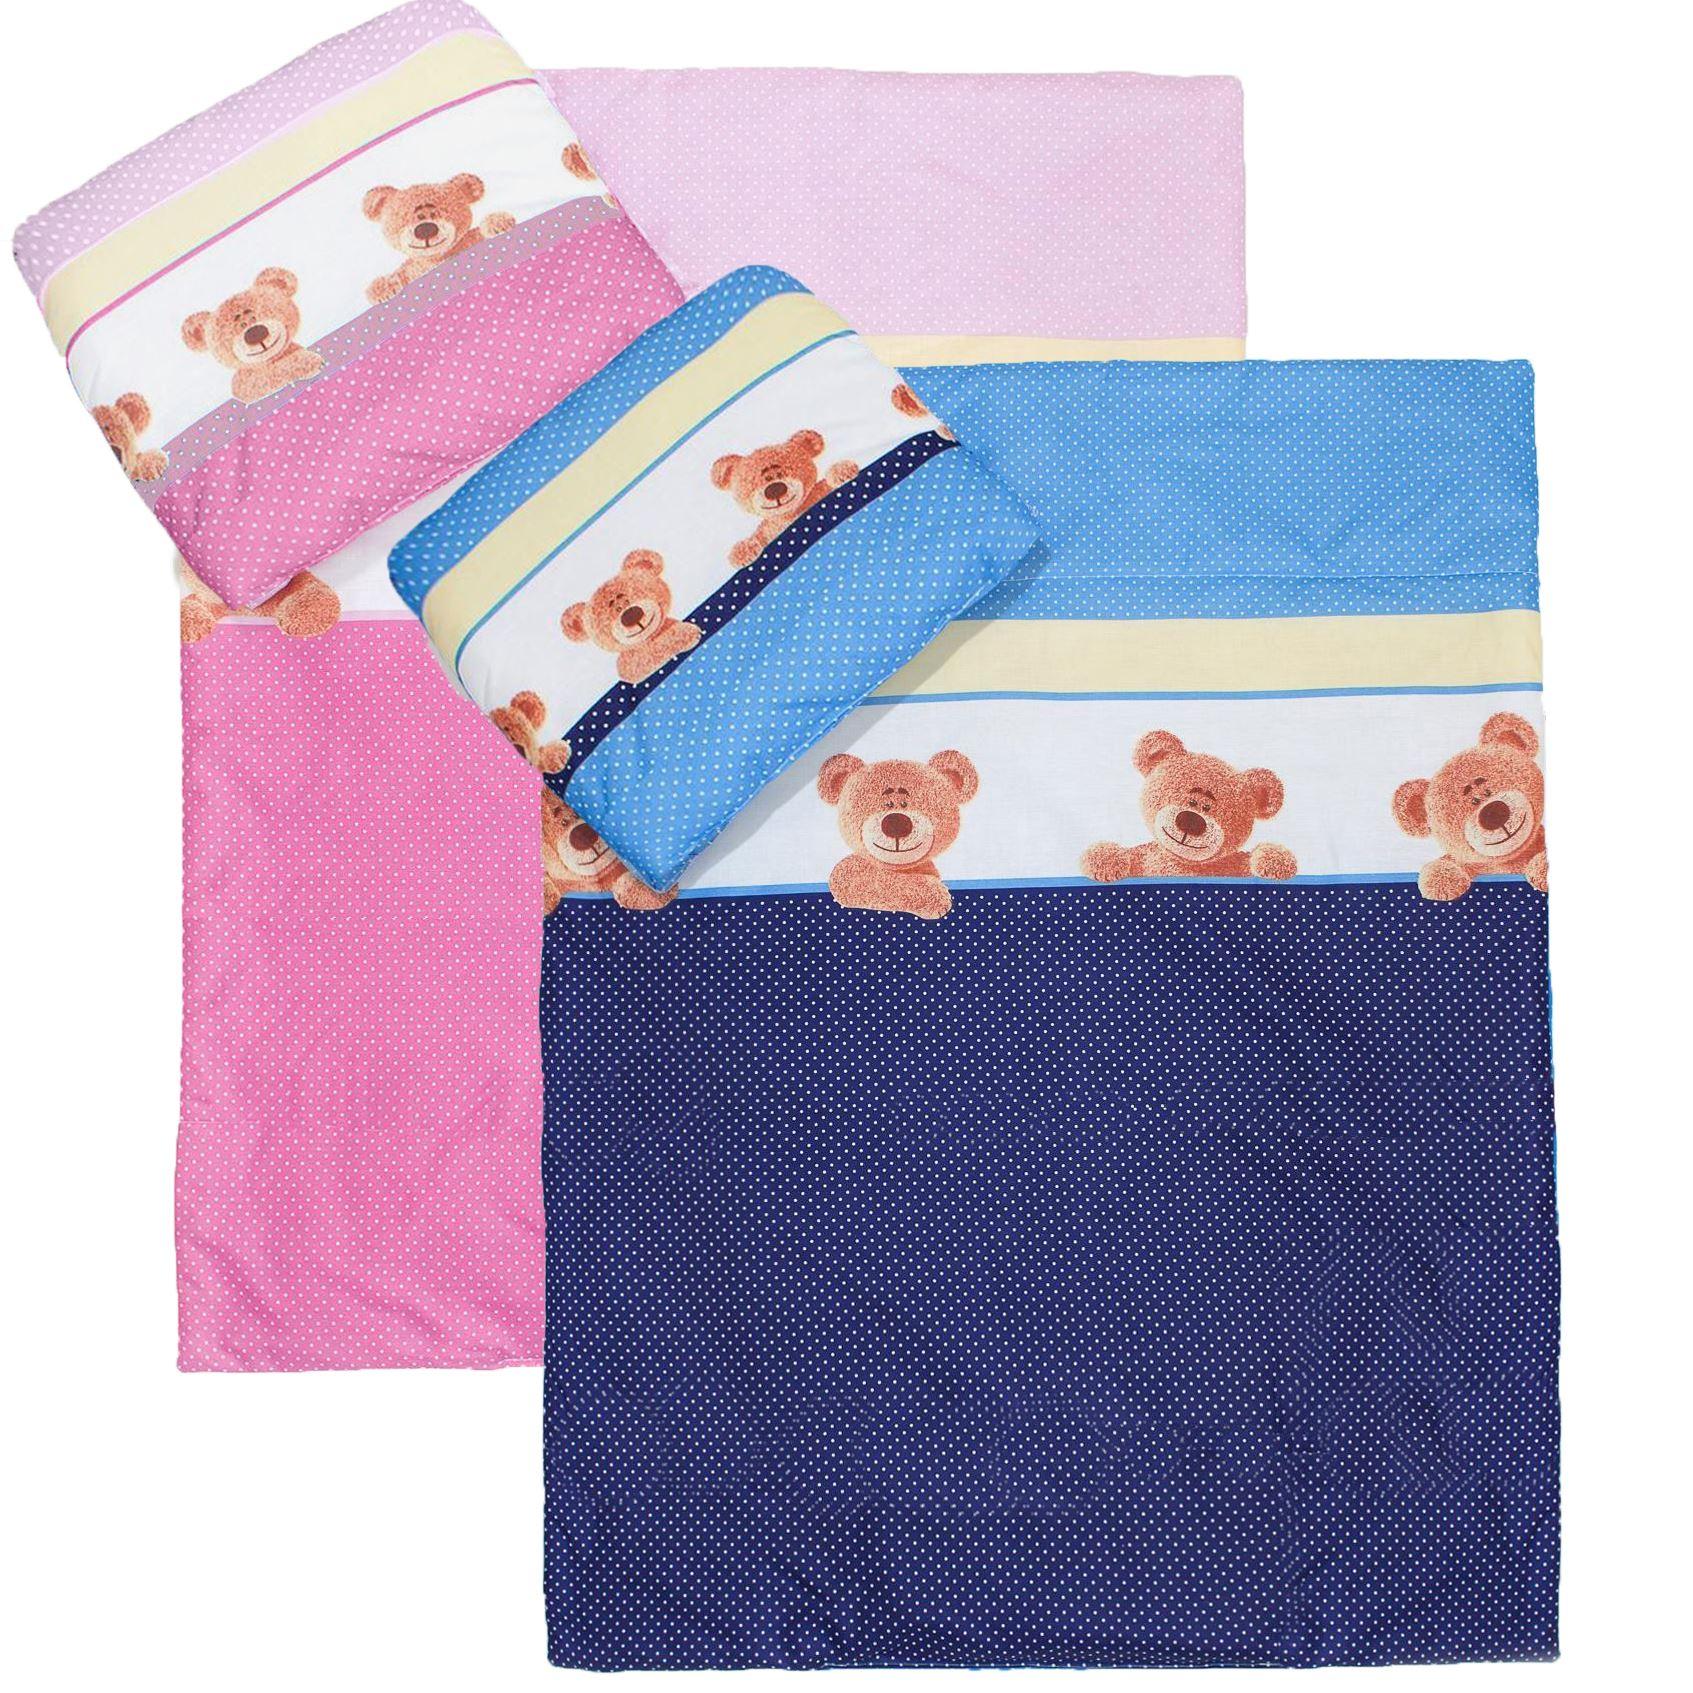 LUX 4 2 pcs pc CRIB BABY BEDDING SET for PRAM MOSES BASKET cotton pillow quilt